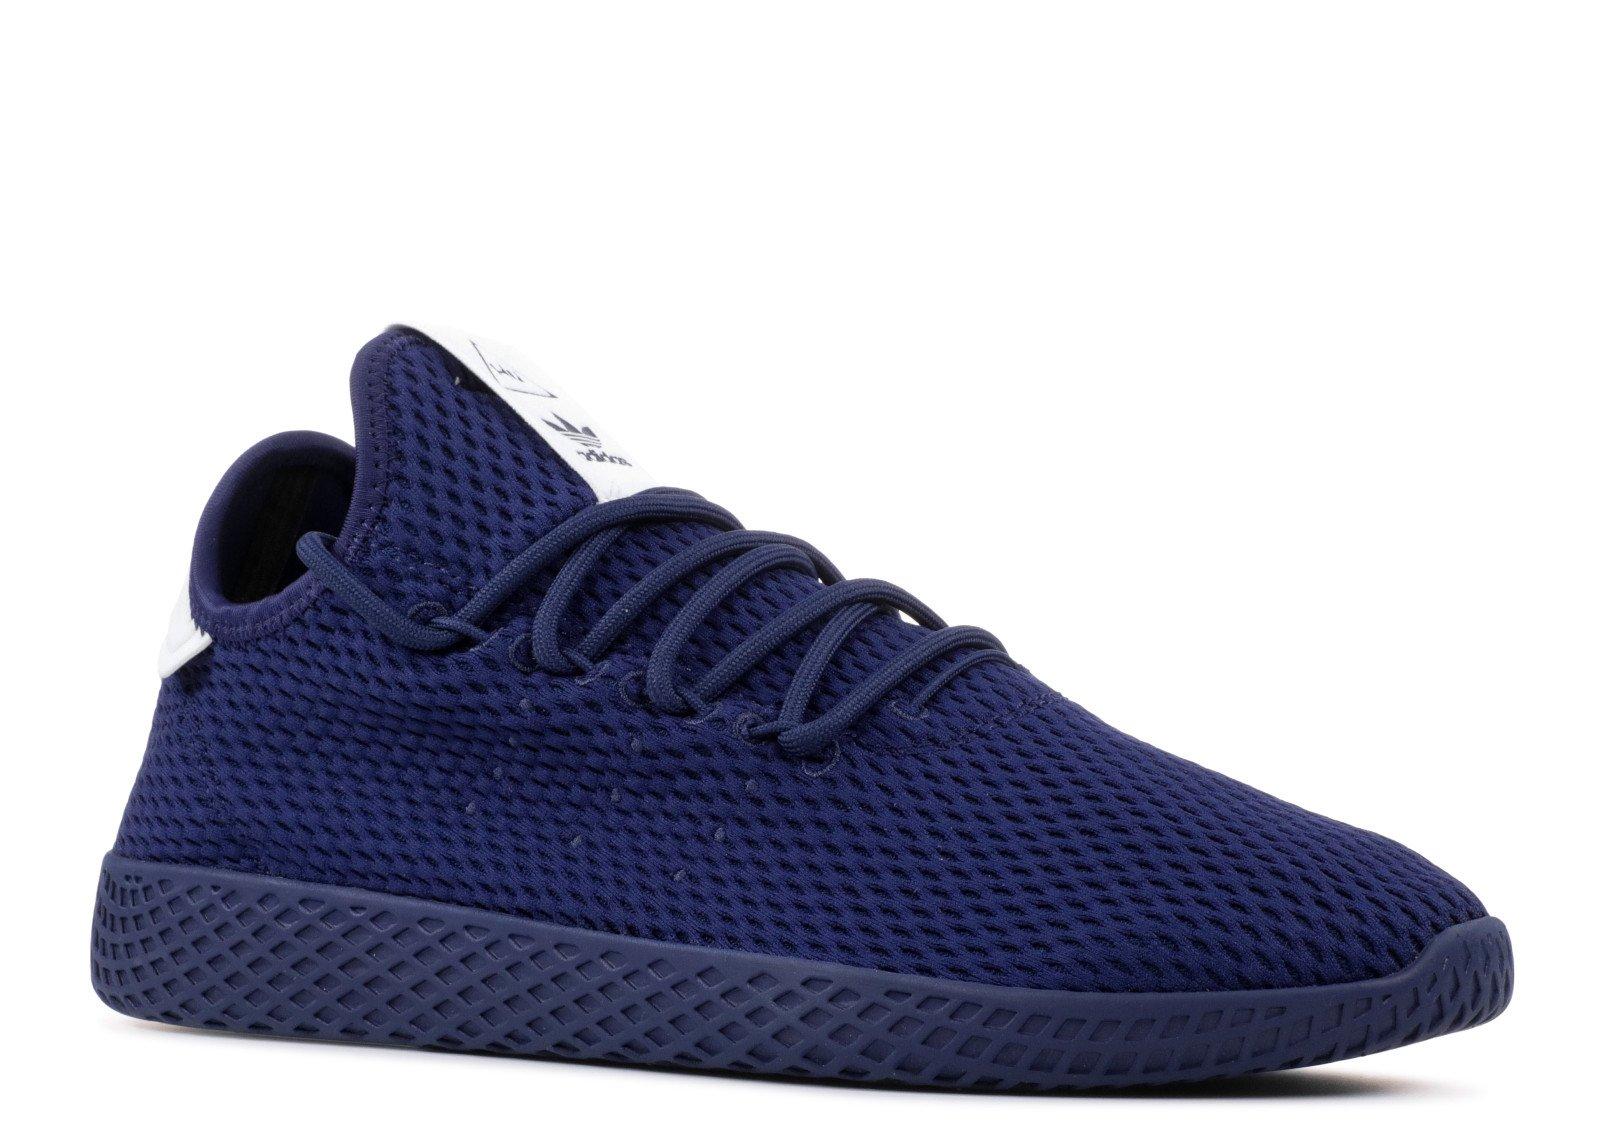 1611c1672 Galleon - Adidas Mens Pharrell Williams Tennis Hu Athletic Shoe (Mens 10.5